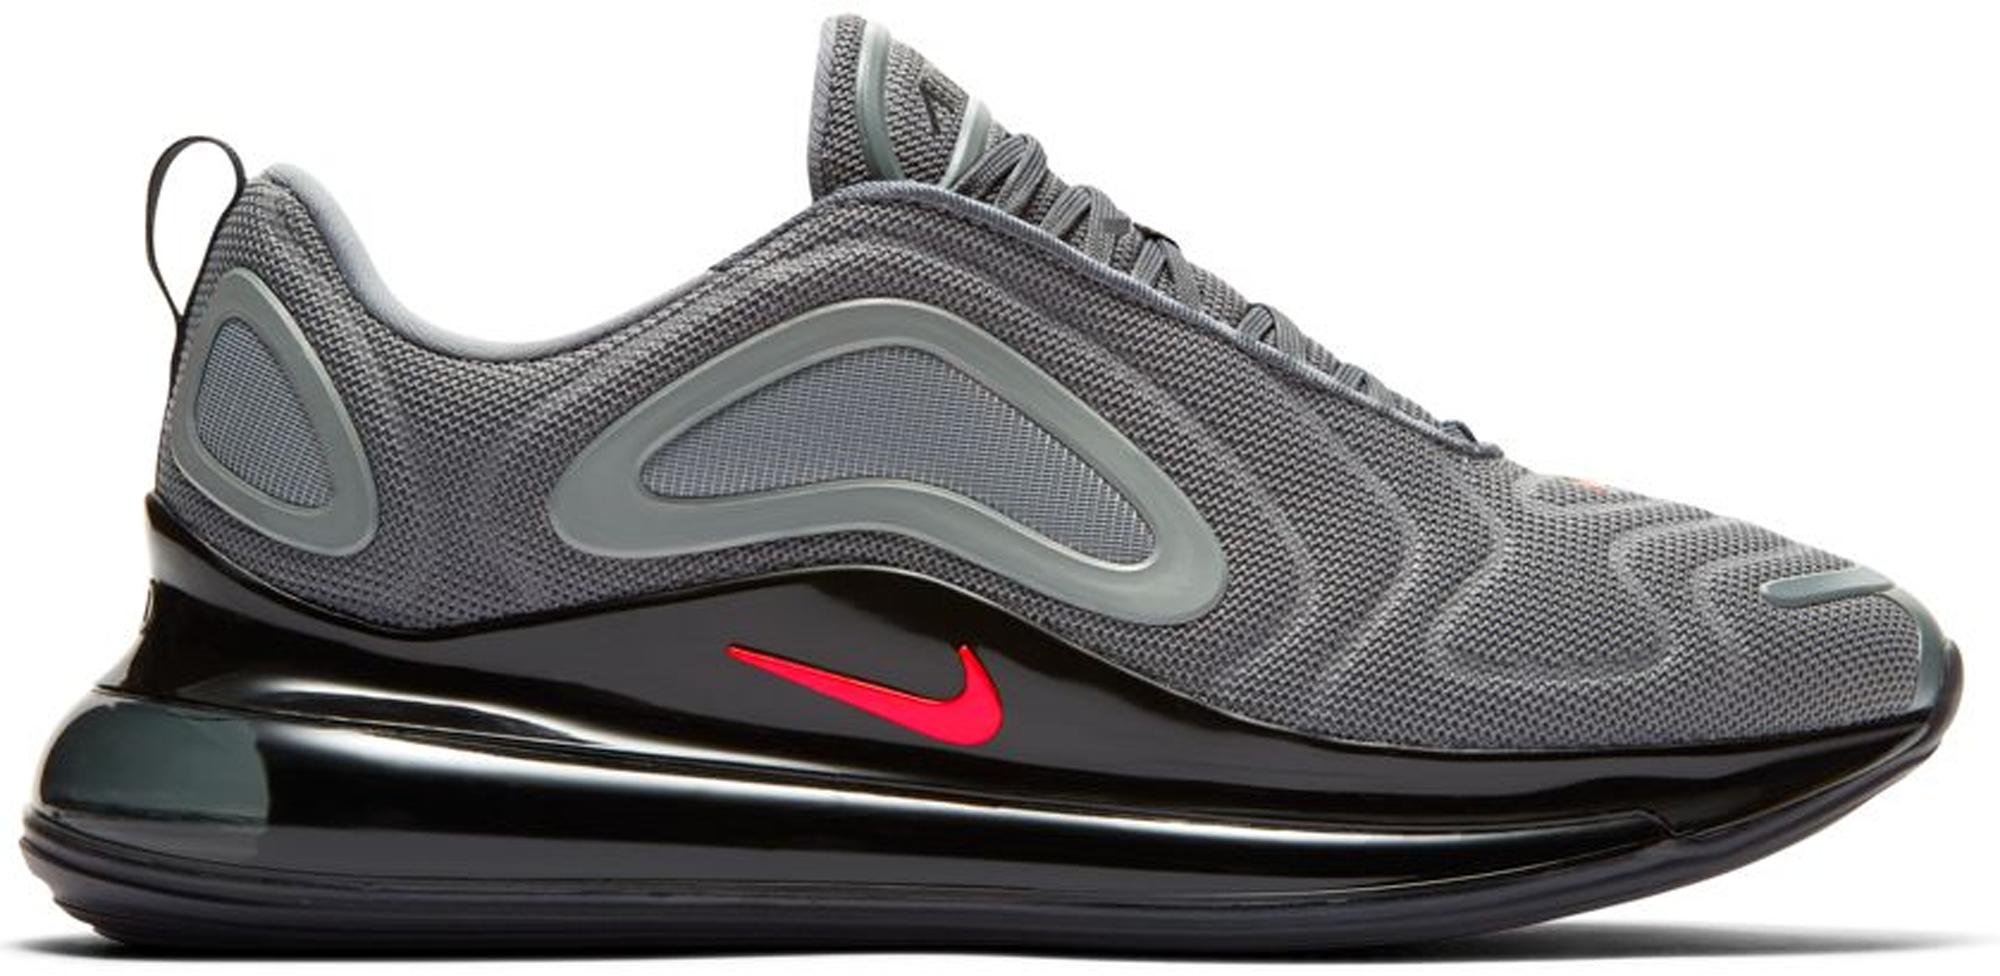 Nike Air Max 720 Cool Grey Bright